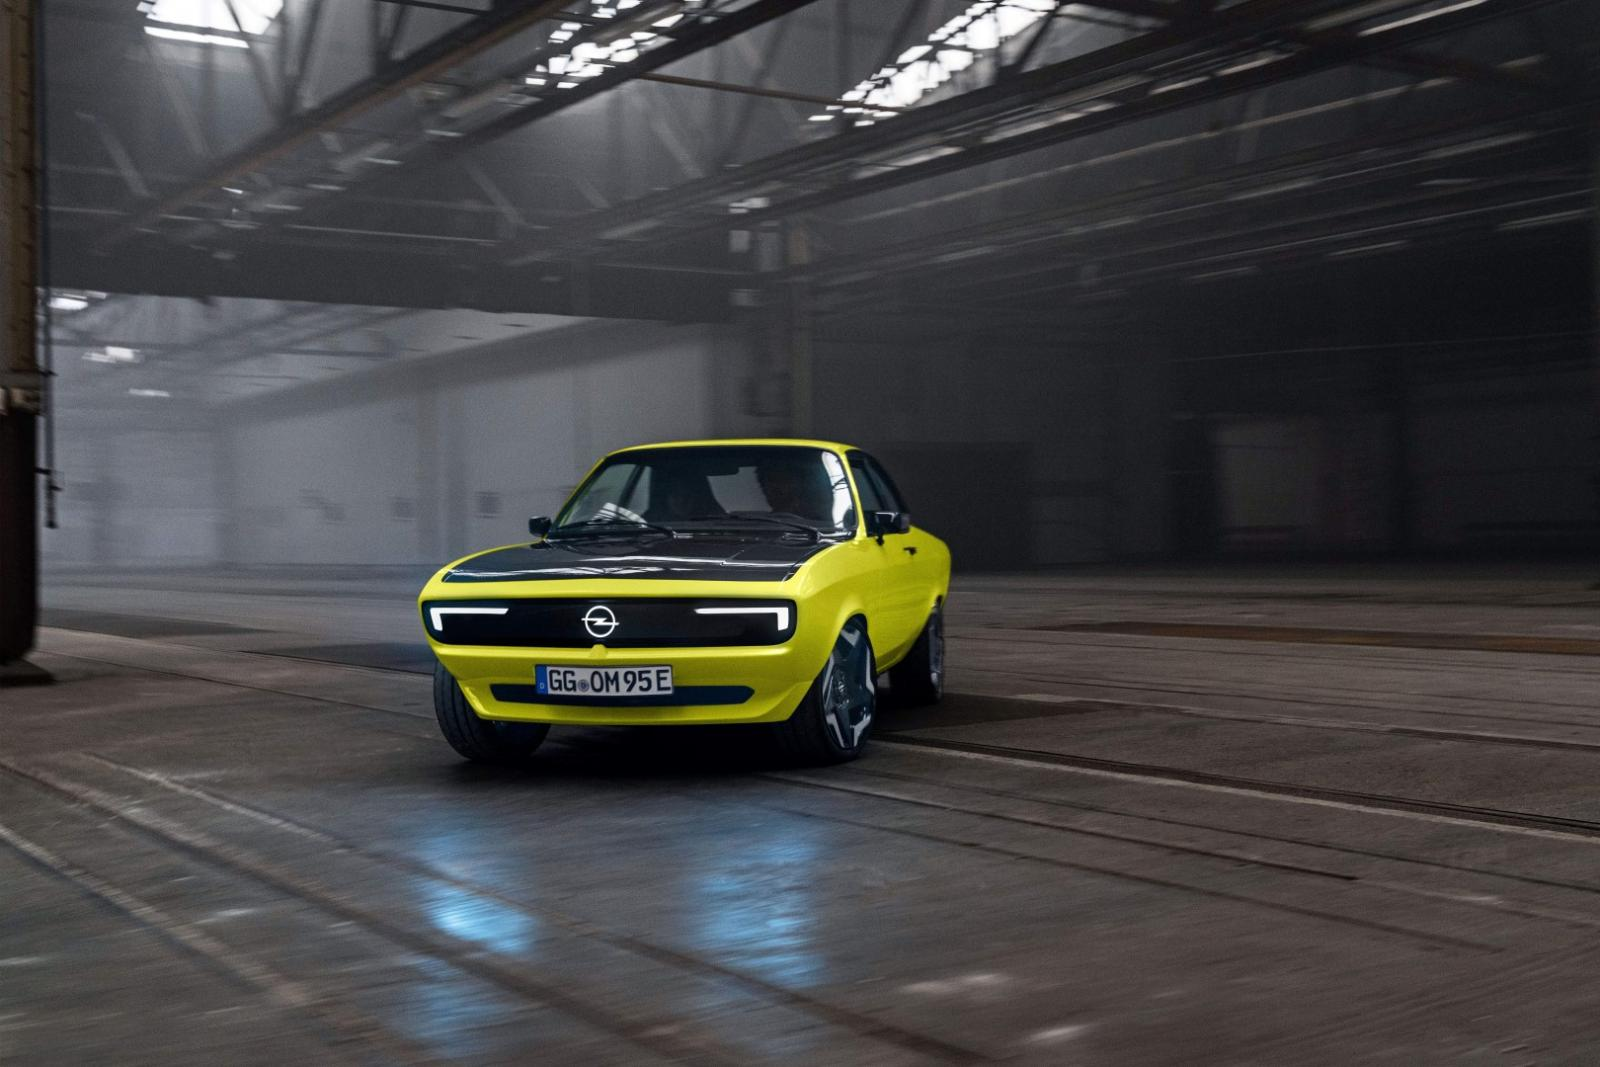 24_Opel-Manta-GSe-ElektroMOD-515658 (Large).jpg